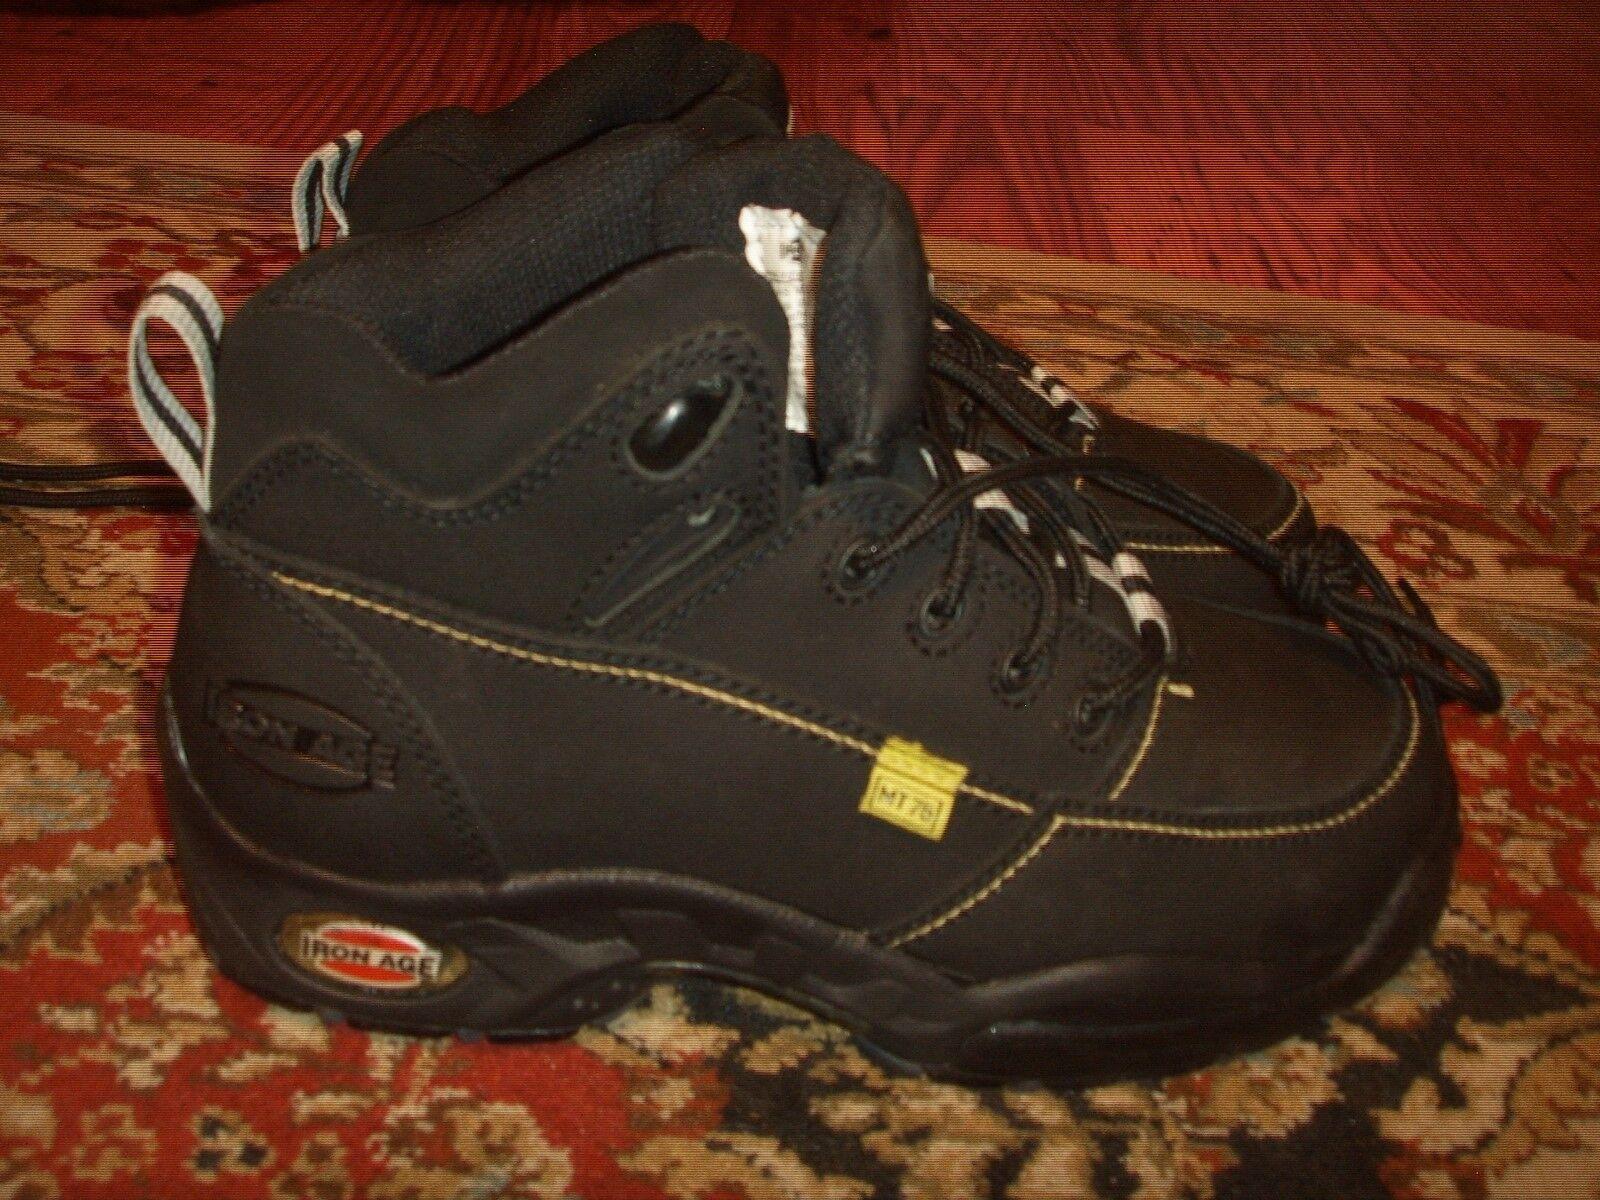 Iron Age High Impact Moc Toe Internal Met Guard Hiker Boot Mens Size 5M